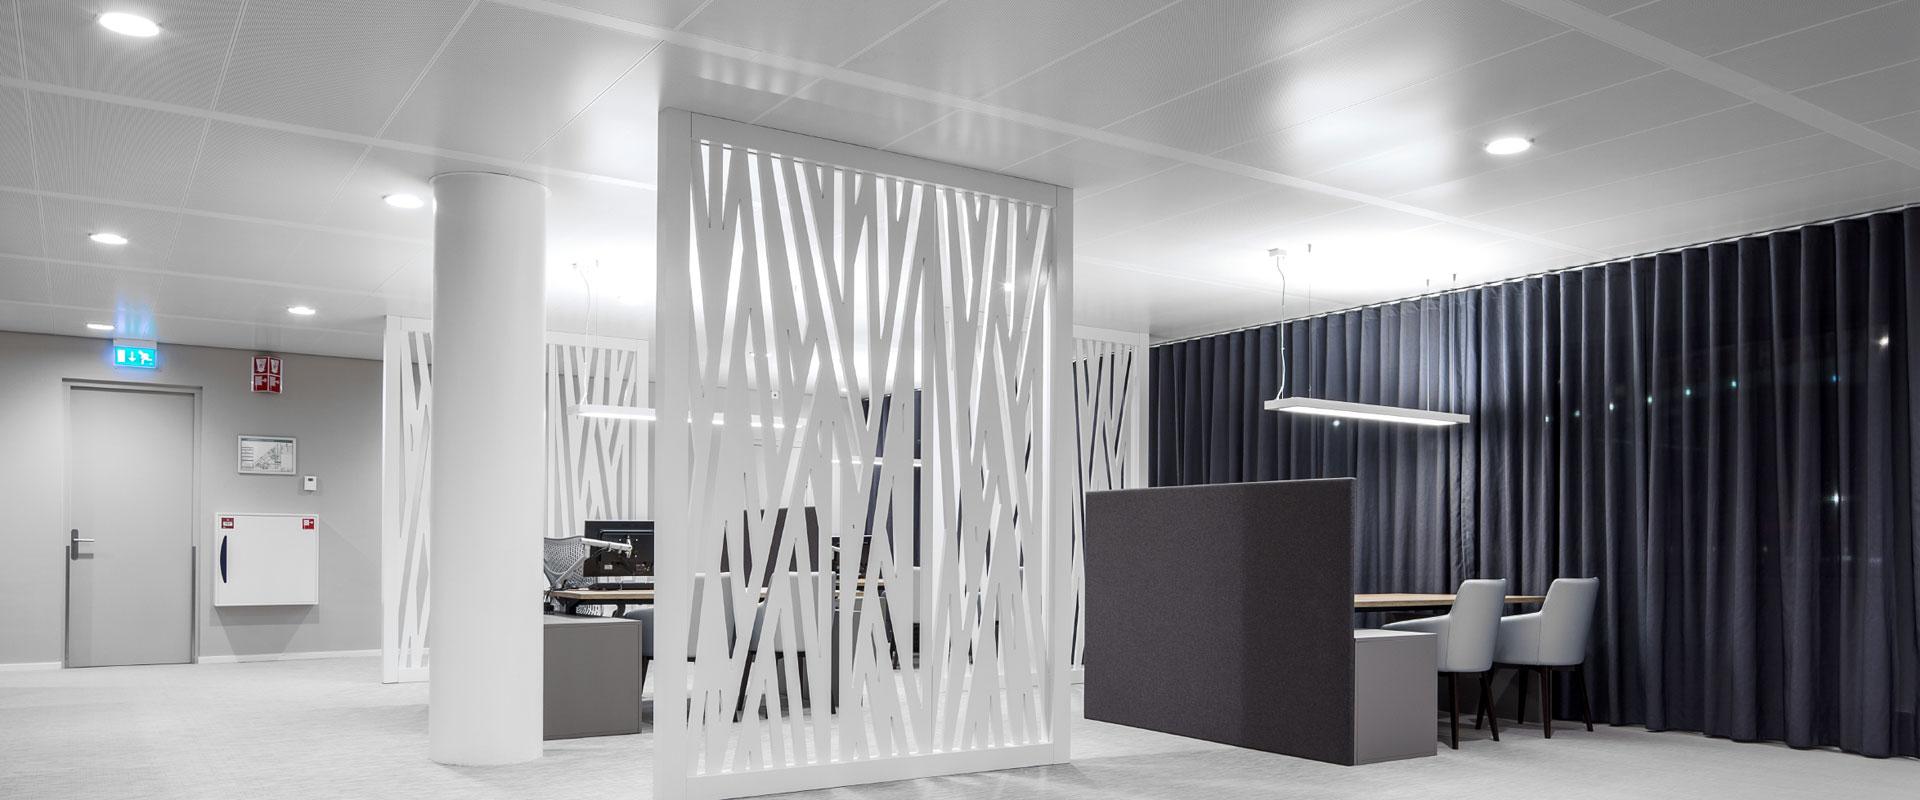 human centric lighting und lichtplanung im b ro trilux. Black Bedroom Furniture Sets. Home Design Ideas